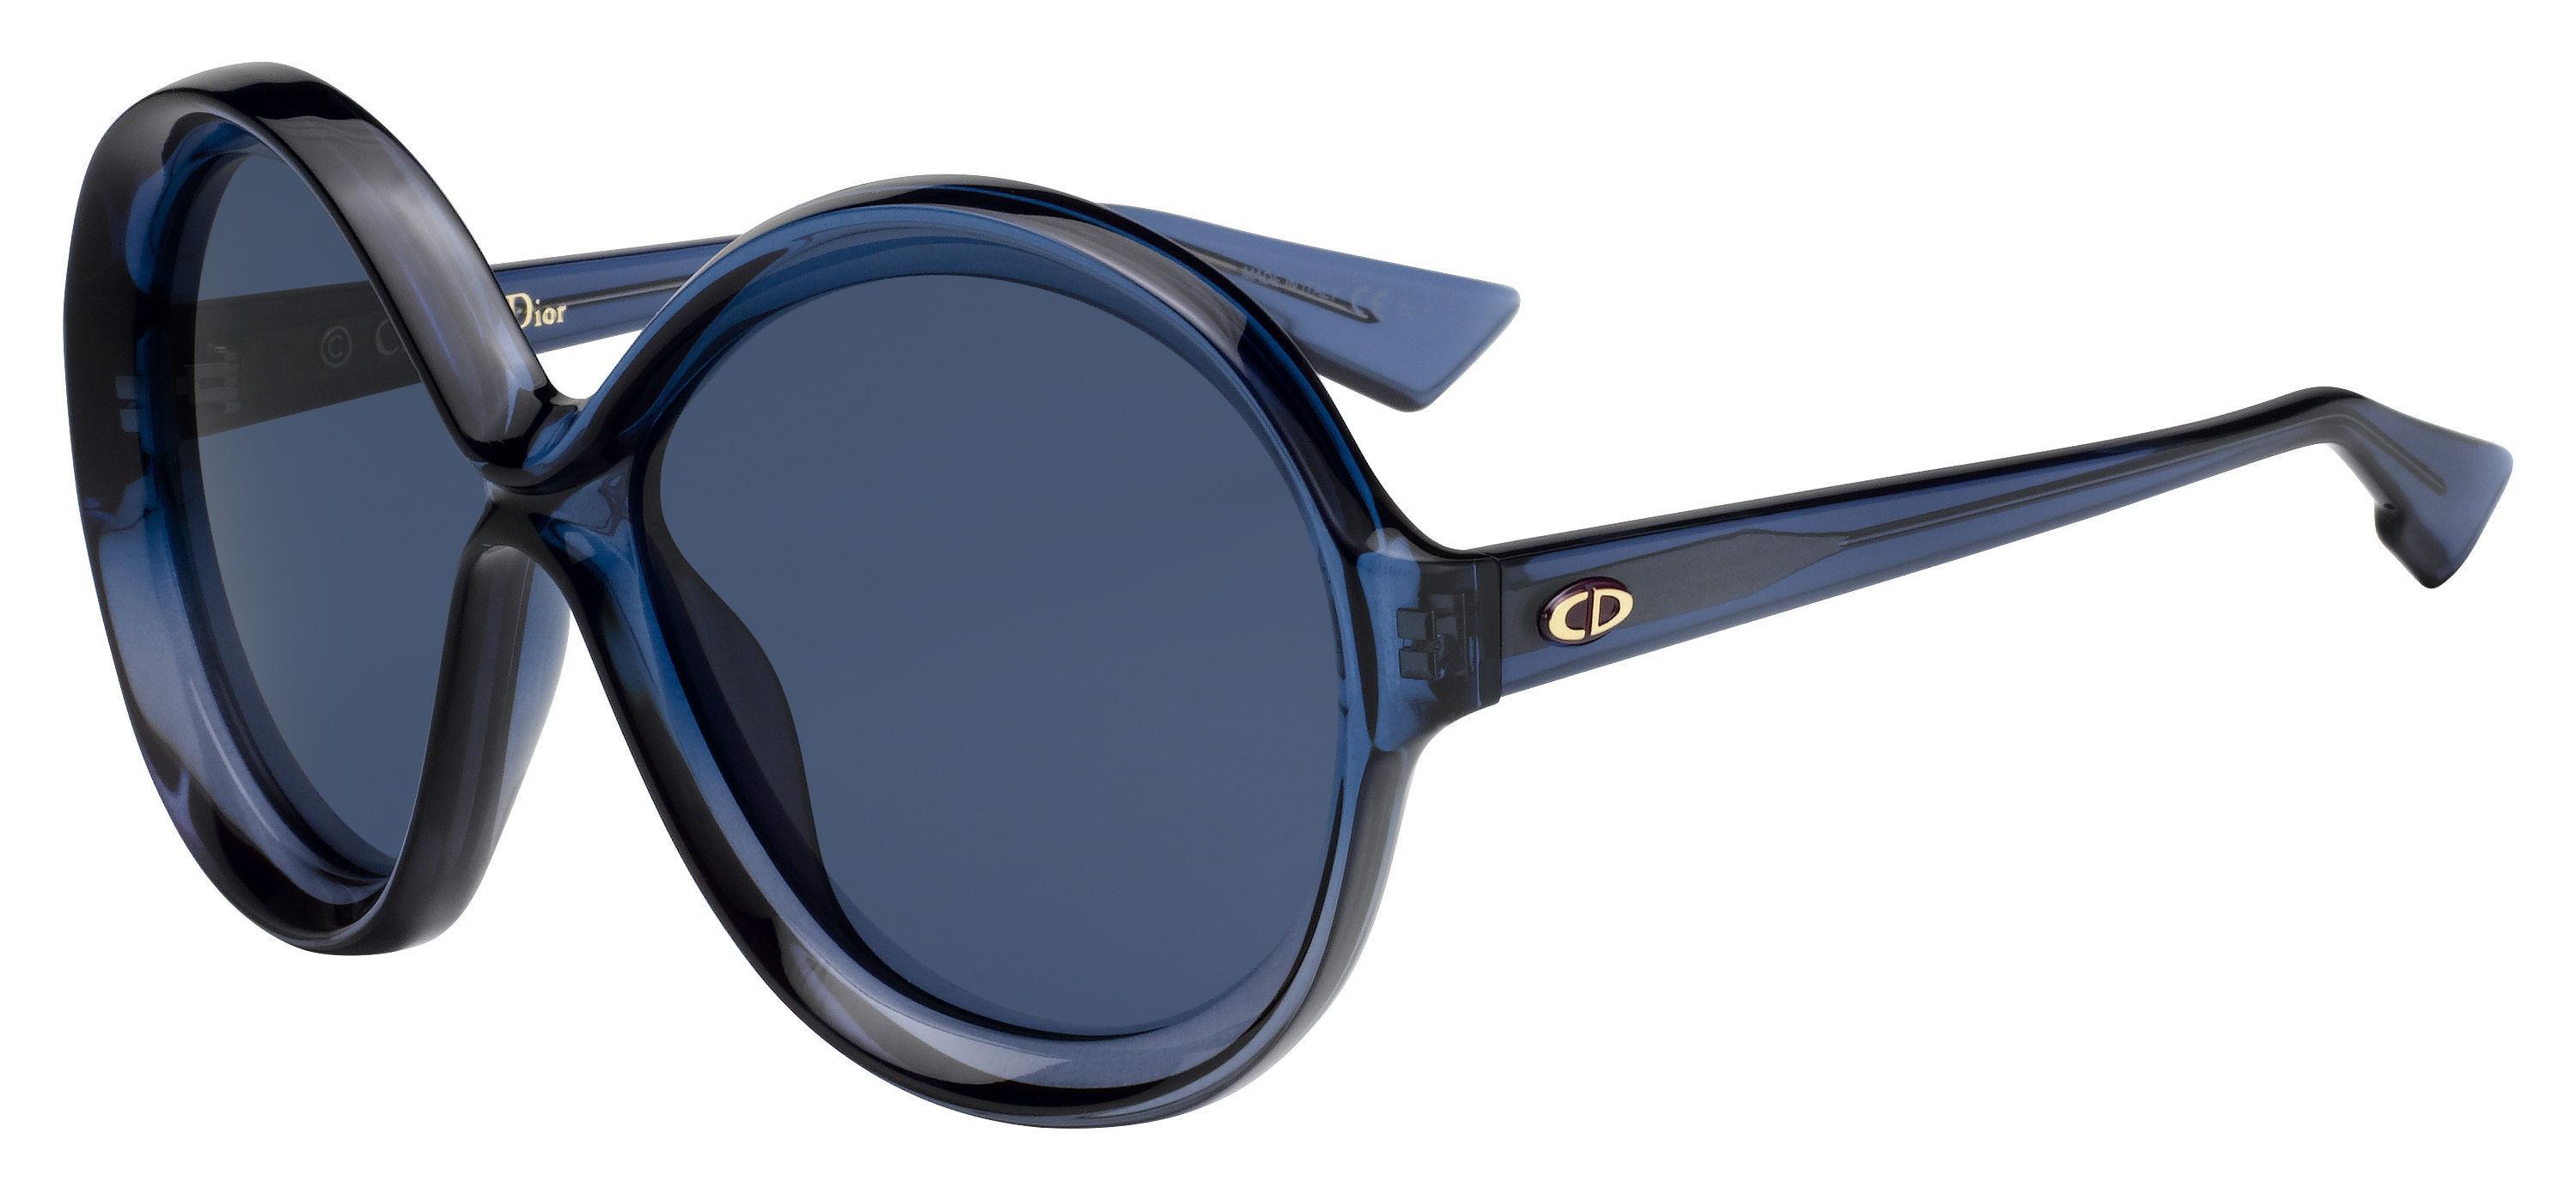 42e3773c5e66f Dior Sunglasses Blue